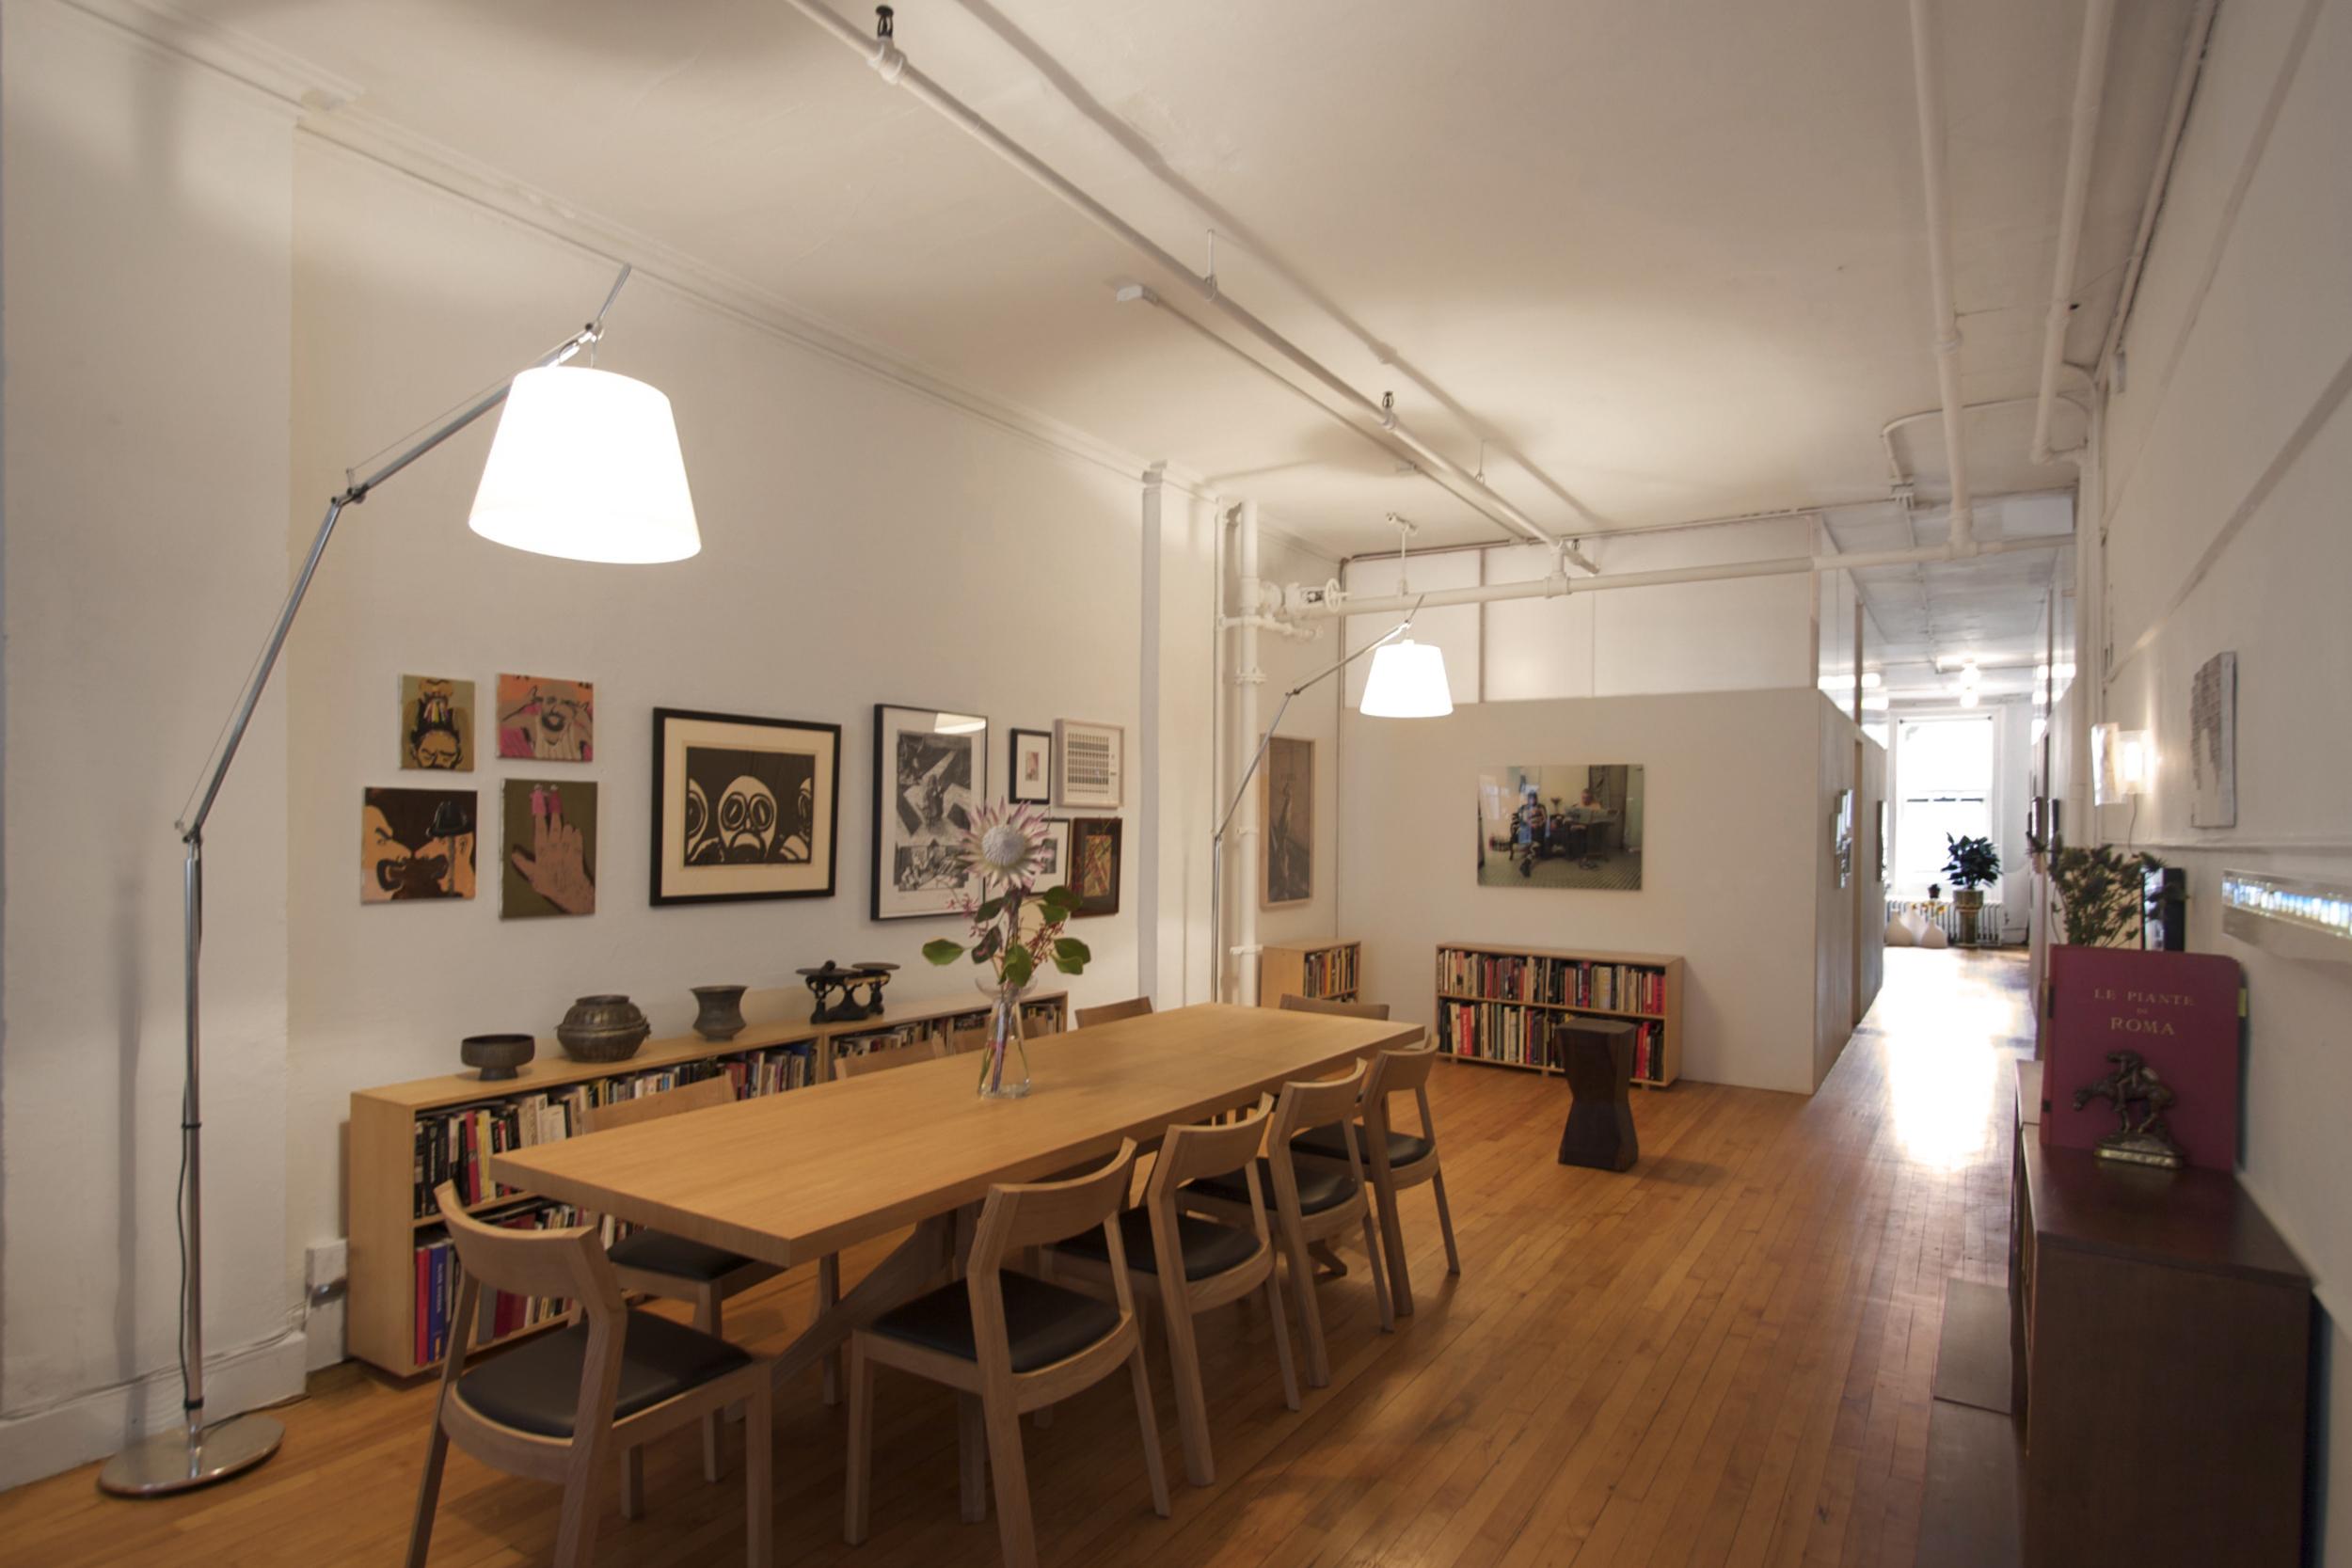 The Architect's Loft